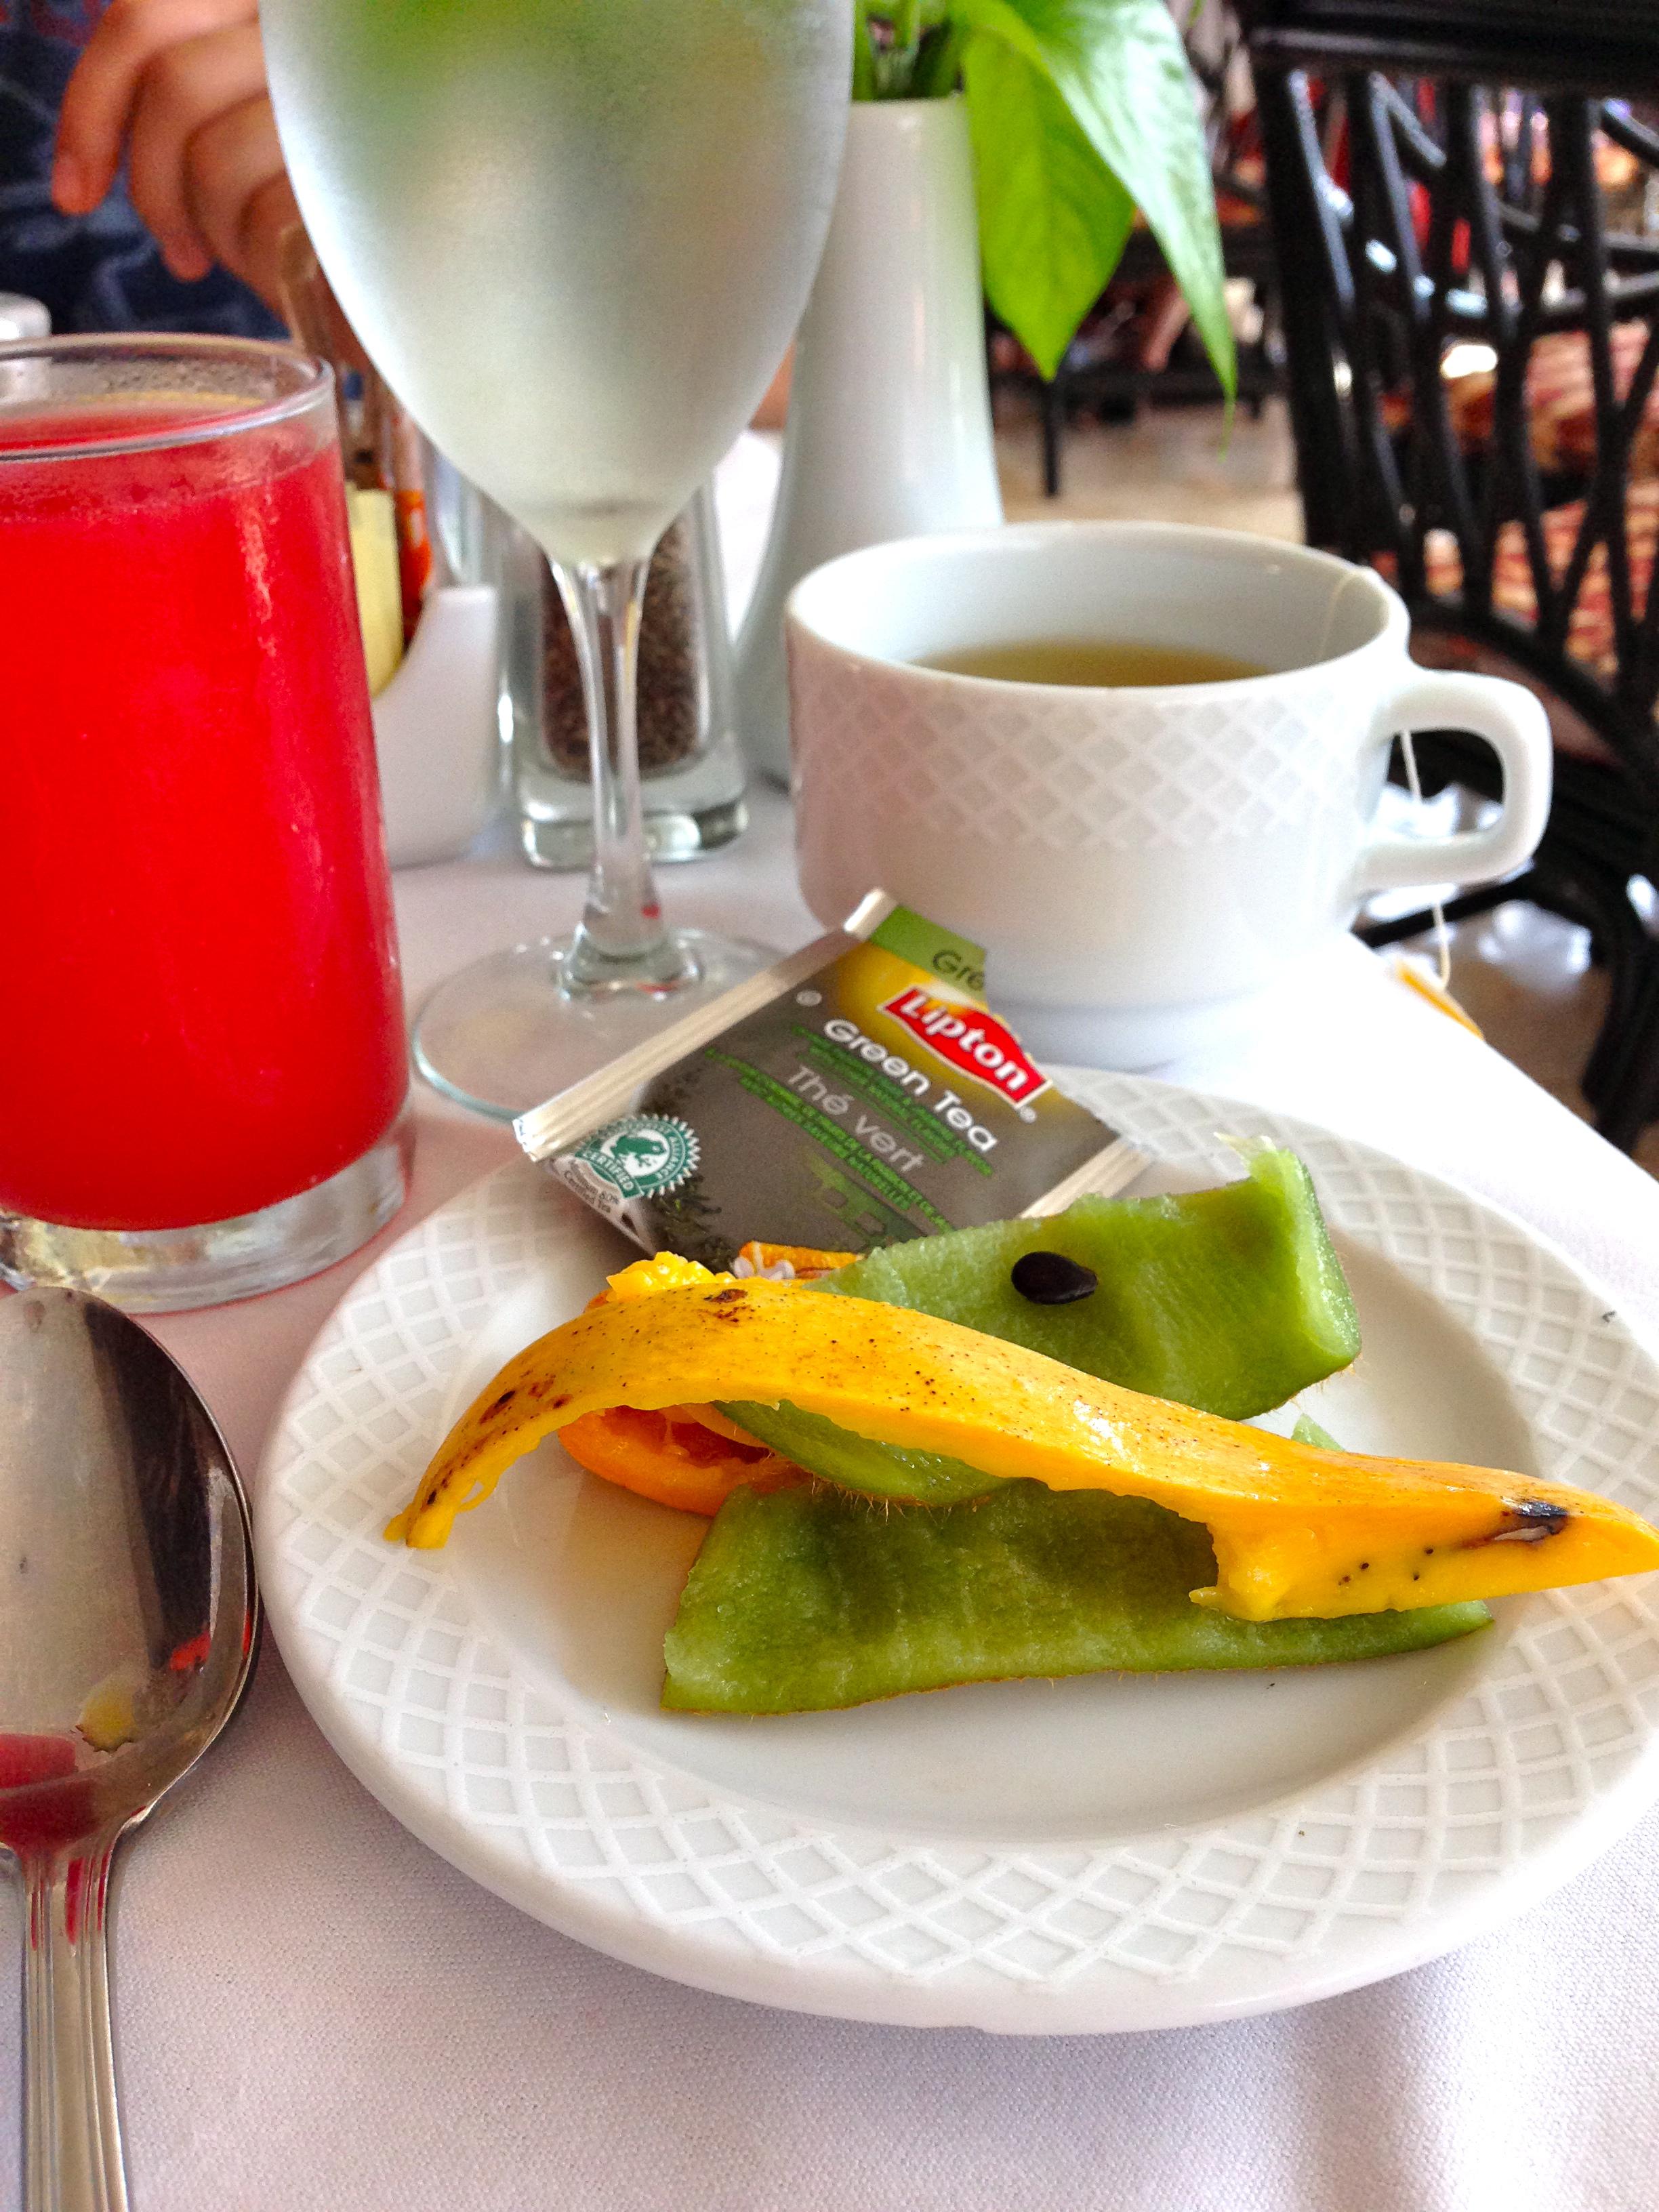 Fruit peels, tea, and watermelon juice. Breakfast of champions.